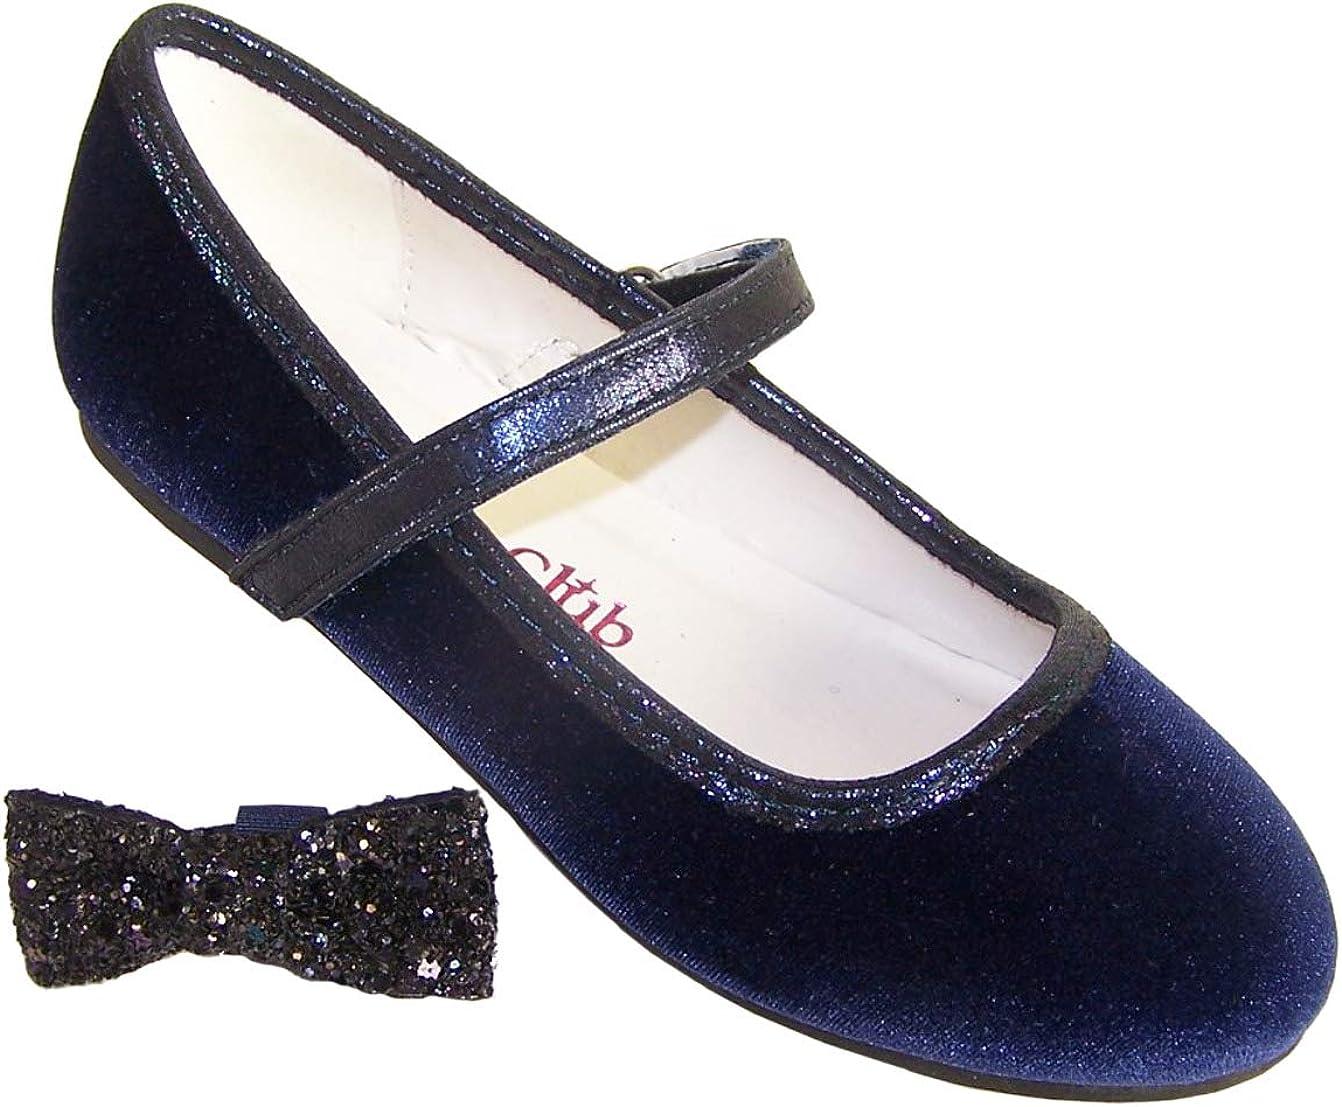 Superfit Childrens Girls 2-00105-89 Ballet Shoes Blue Lips